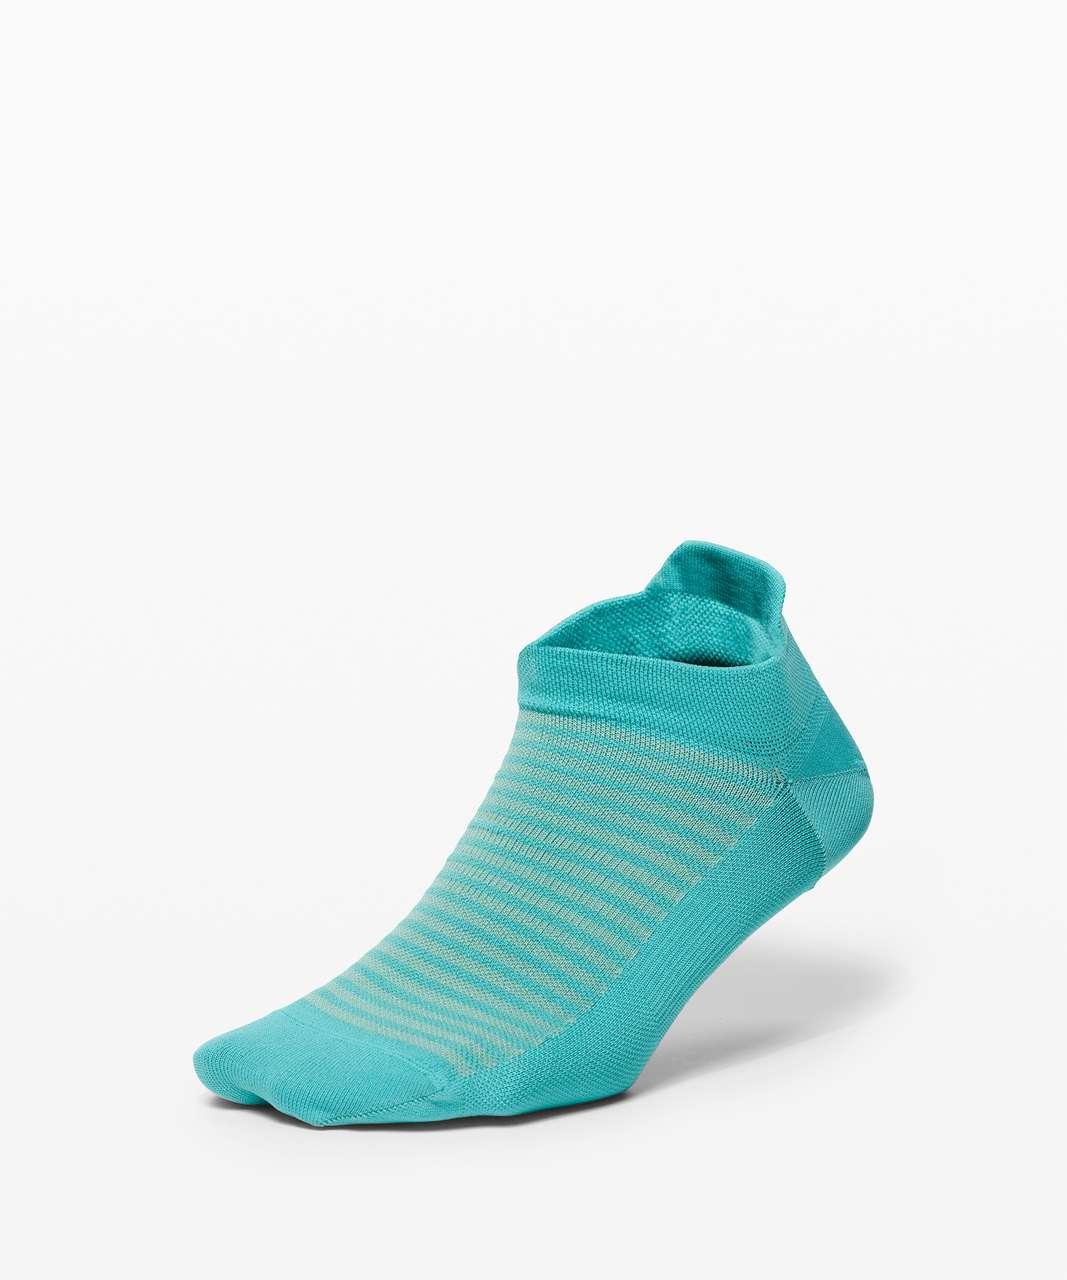 Lululemon Light Speed Sock *Silver - Aqua Aura / Rip Tide